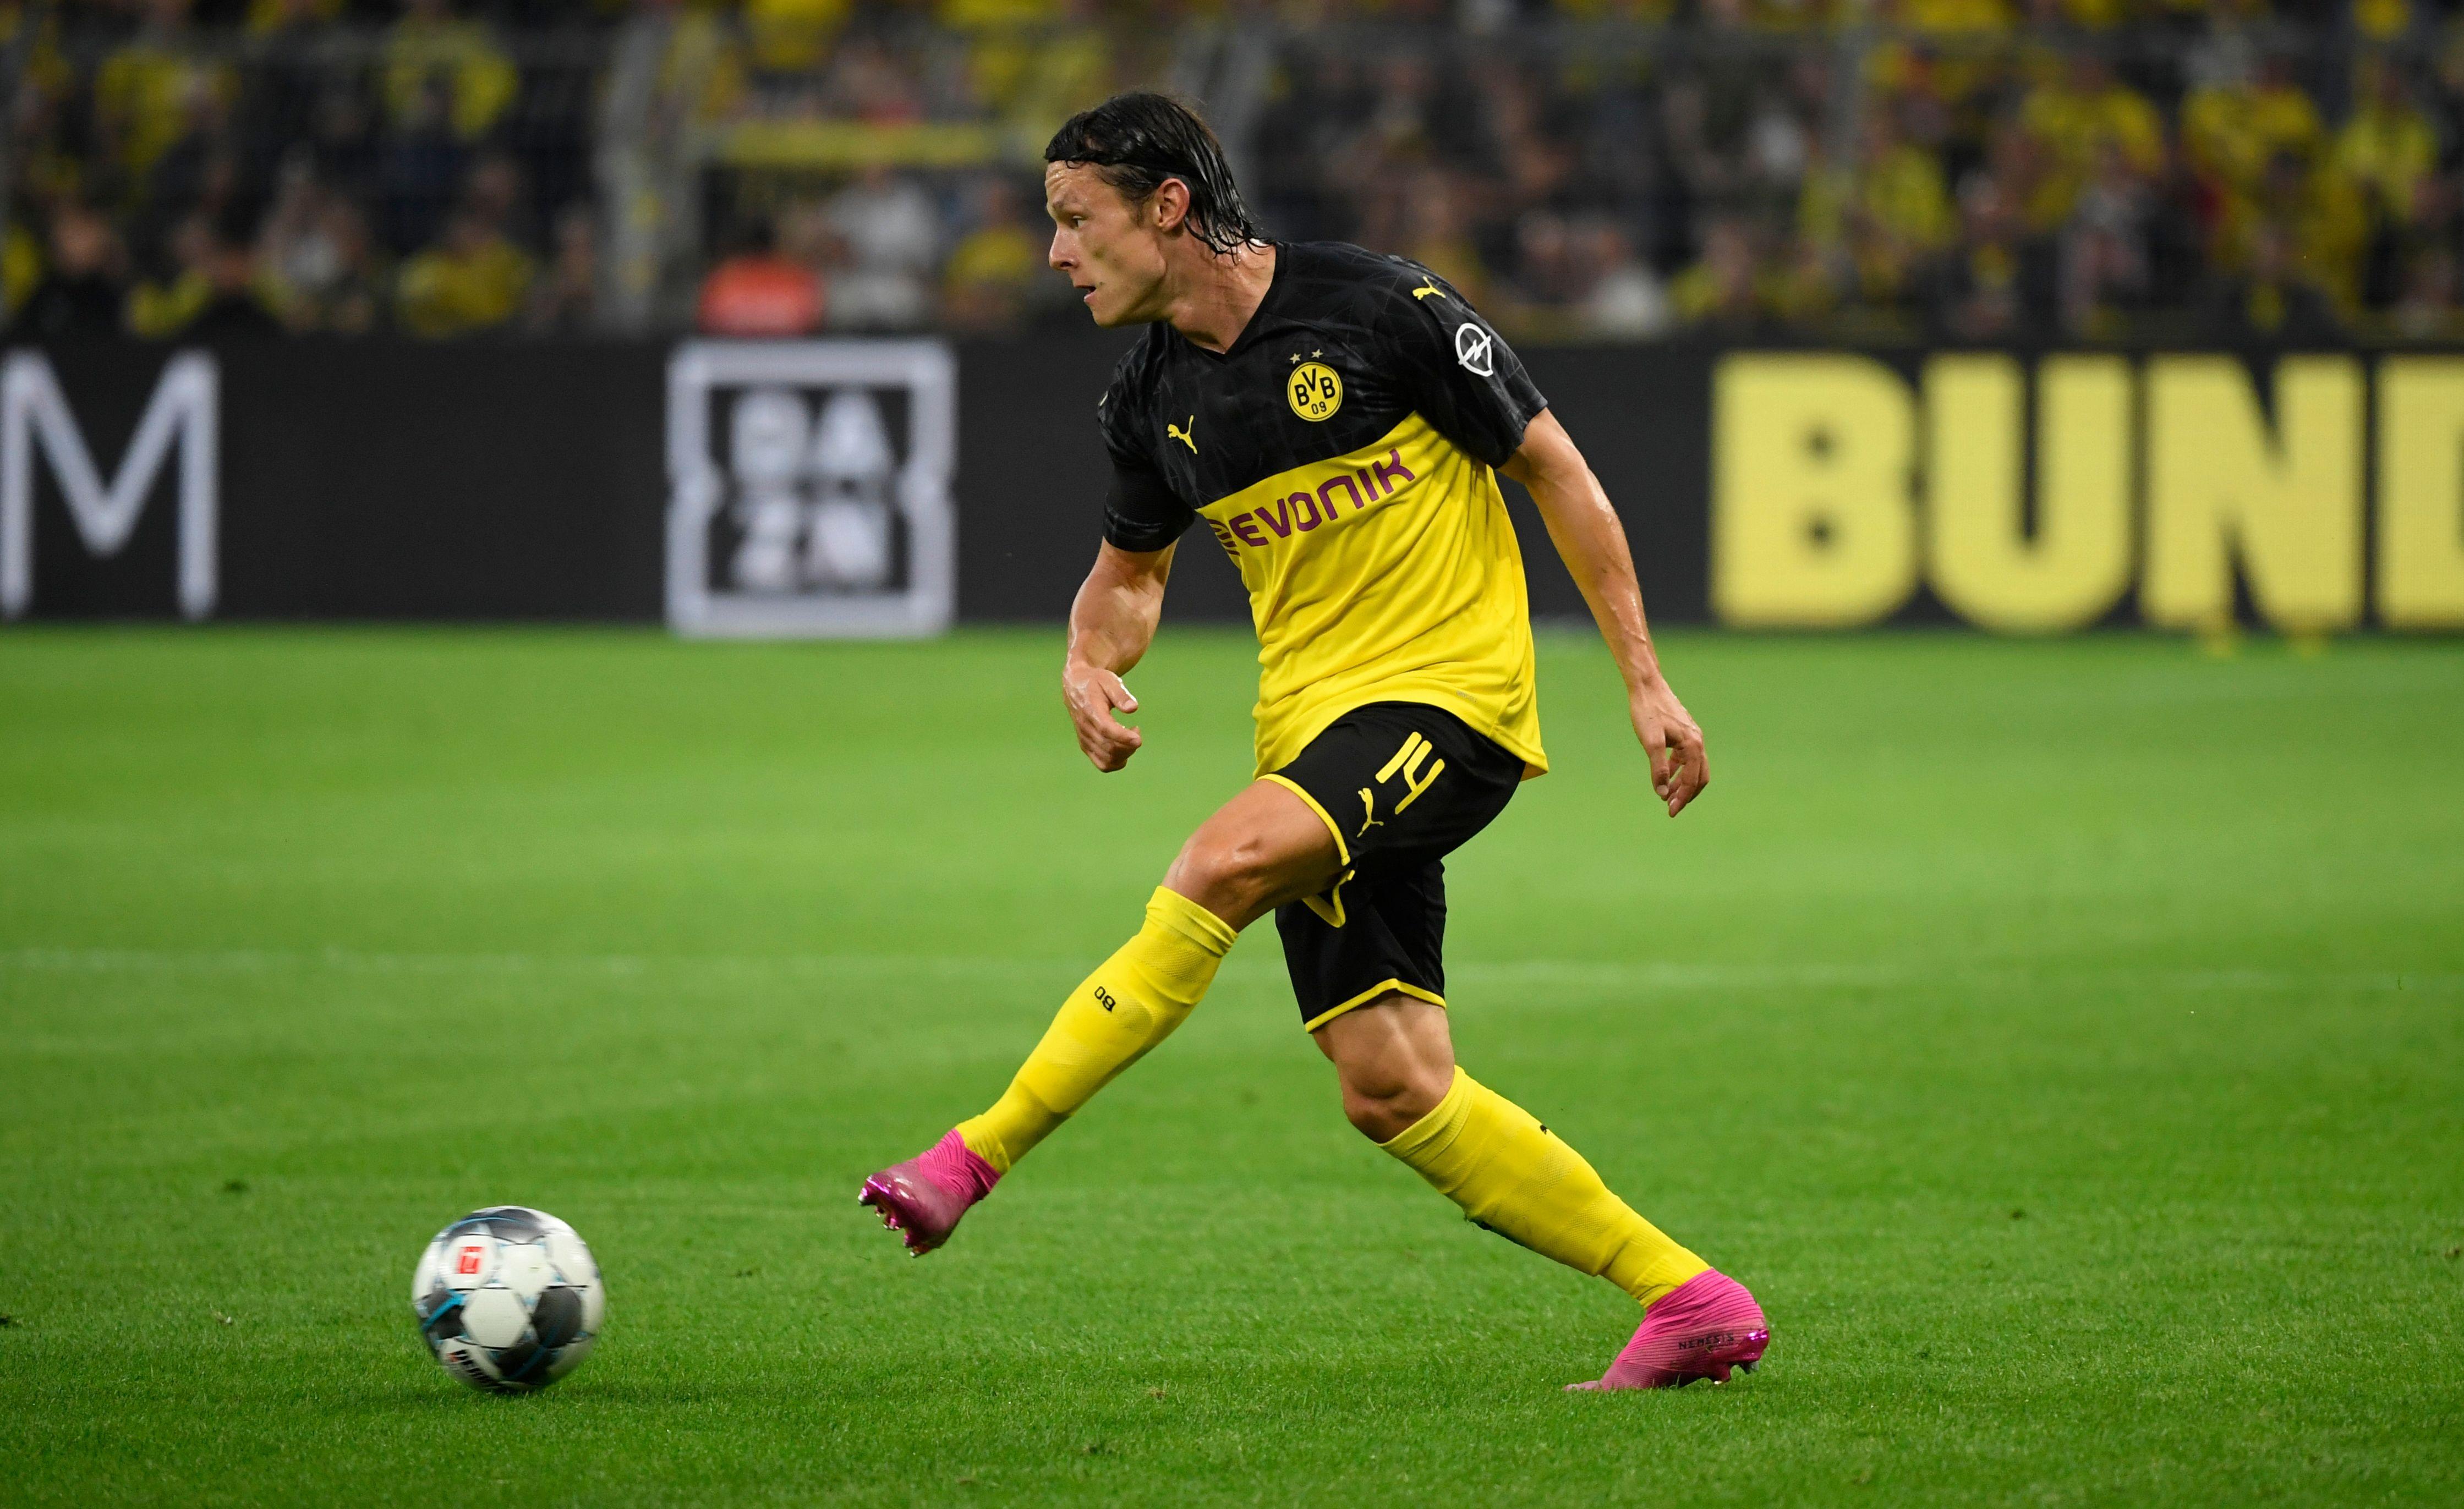 Borussia Dortmund vs M Gladbach Soccer Betting Predictions